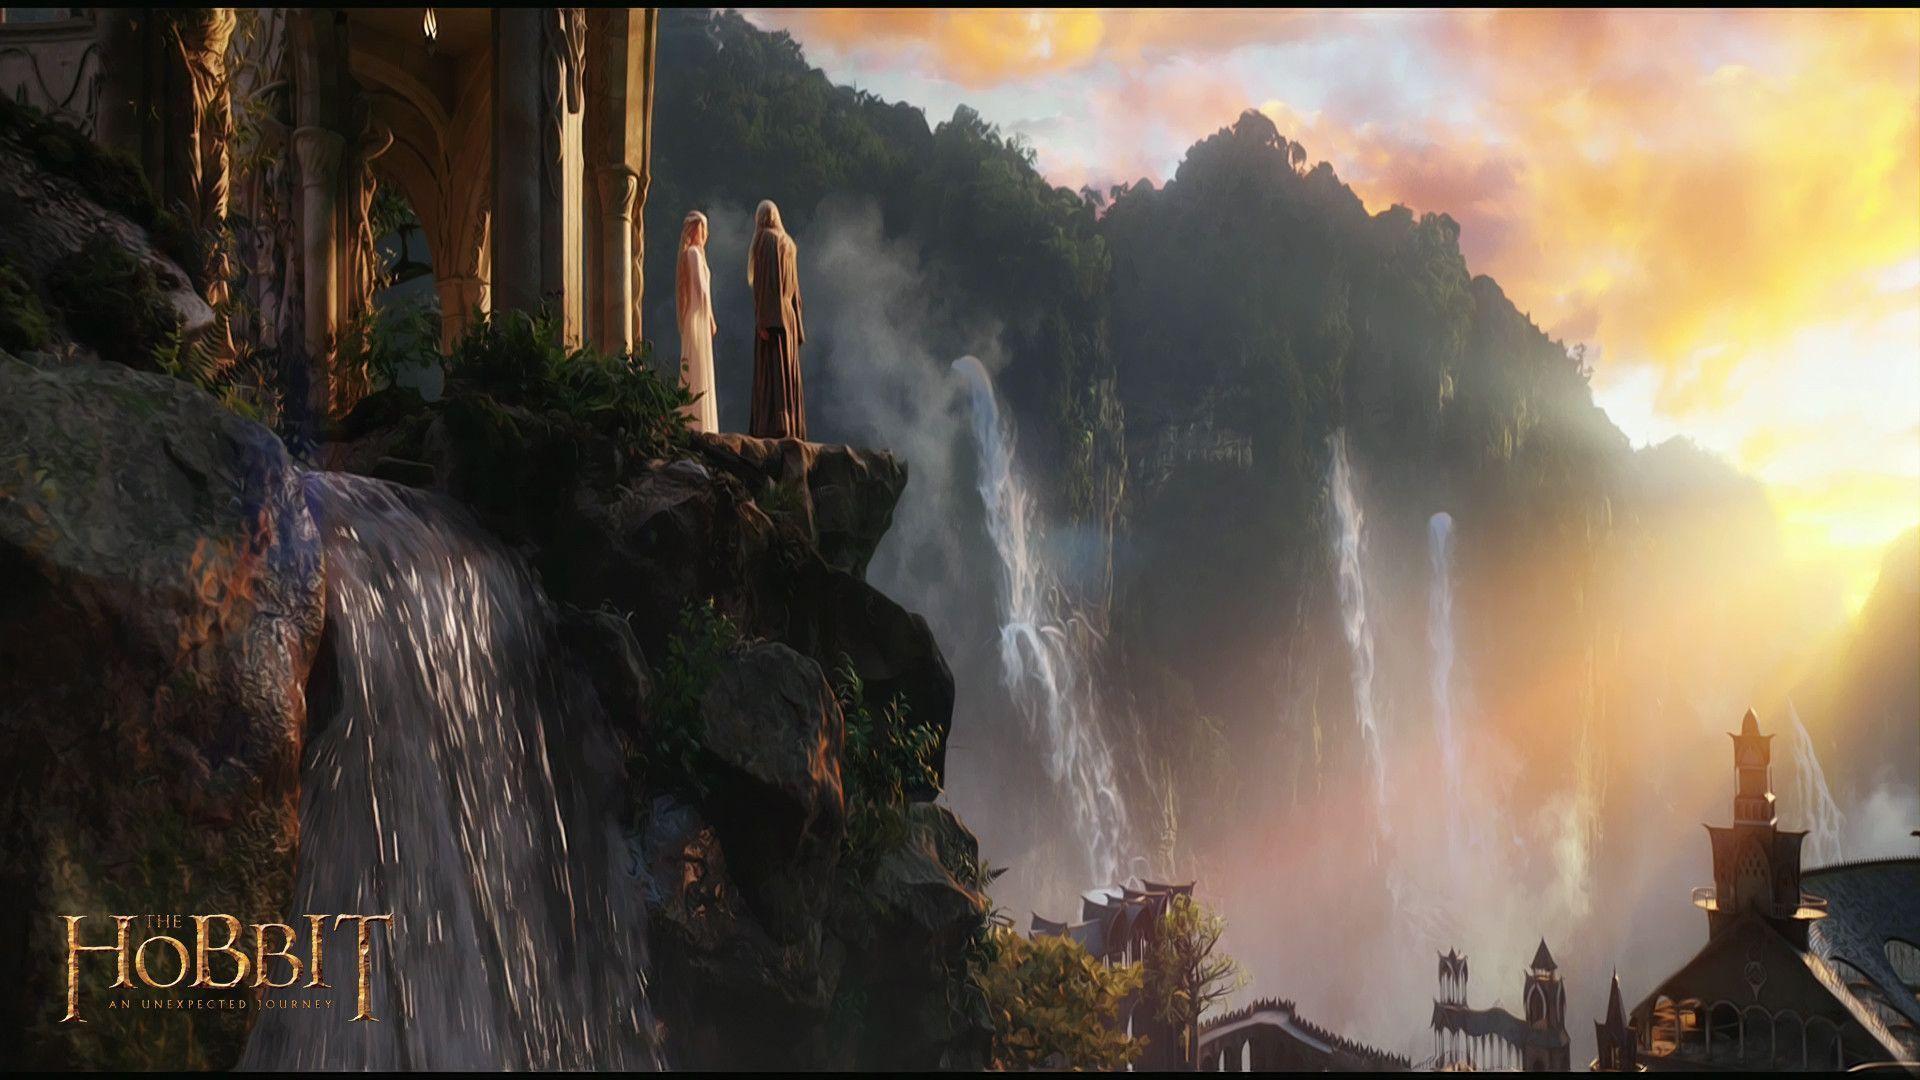 The Hobbit Wallpapers HD - Wallpaper Cave